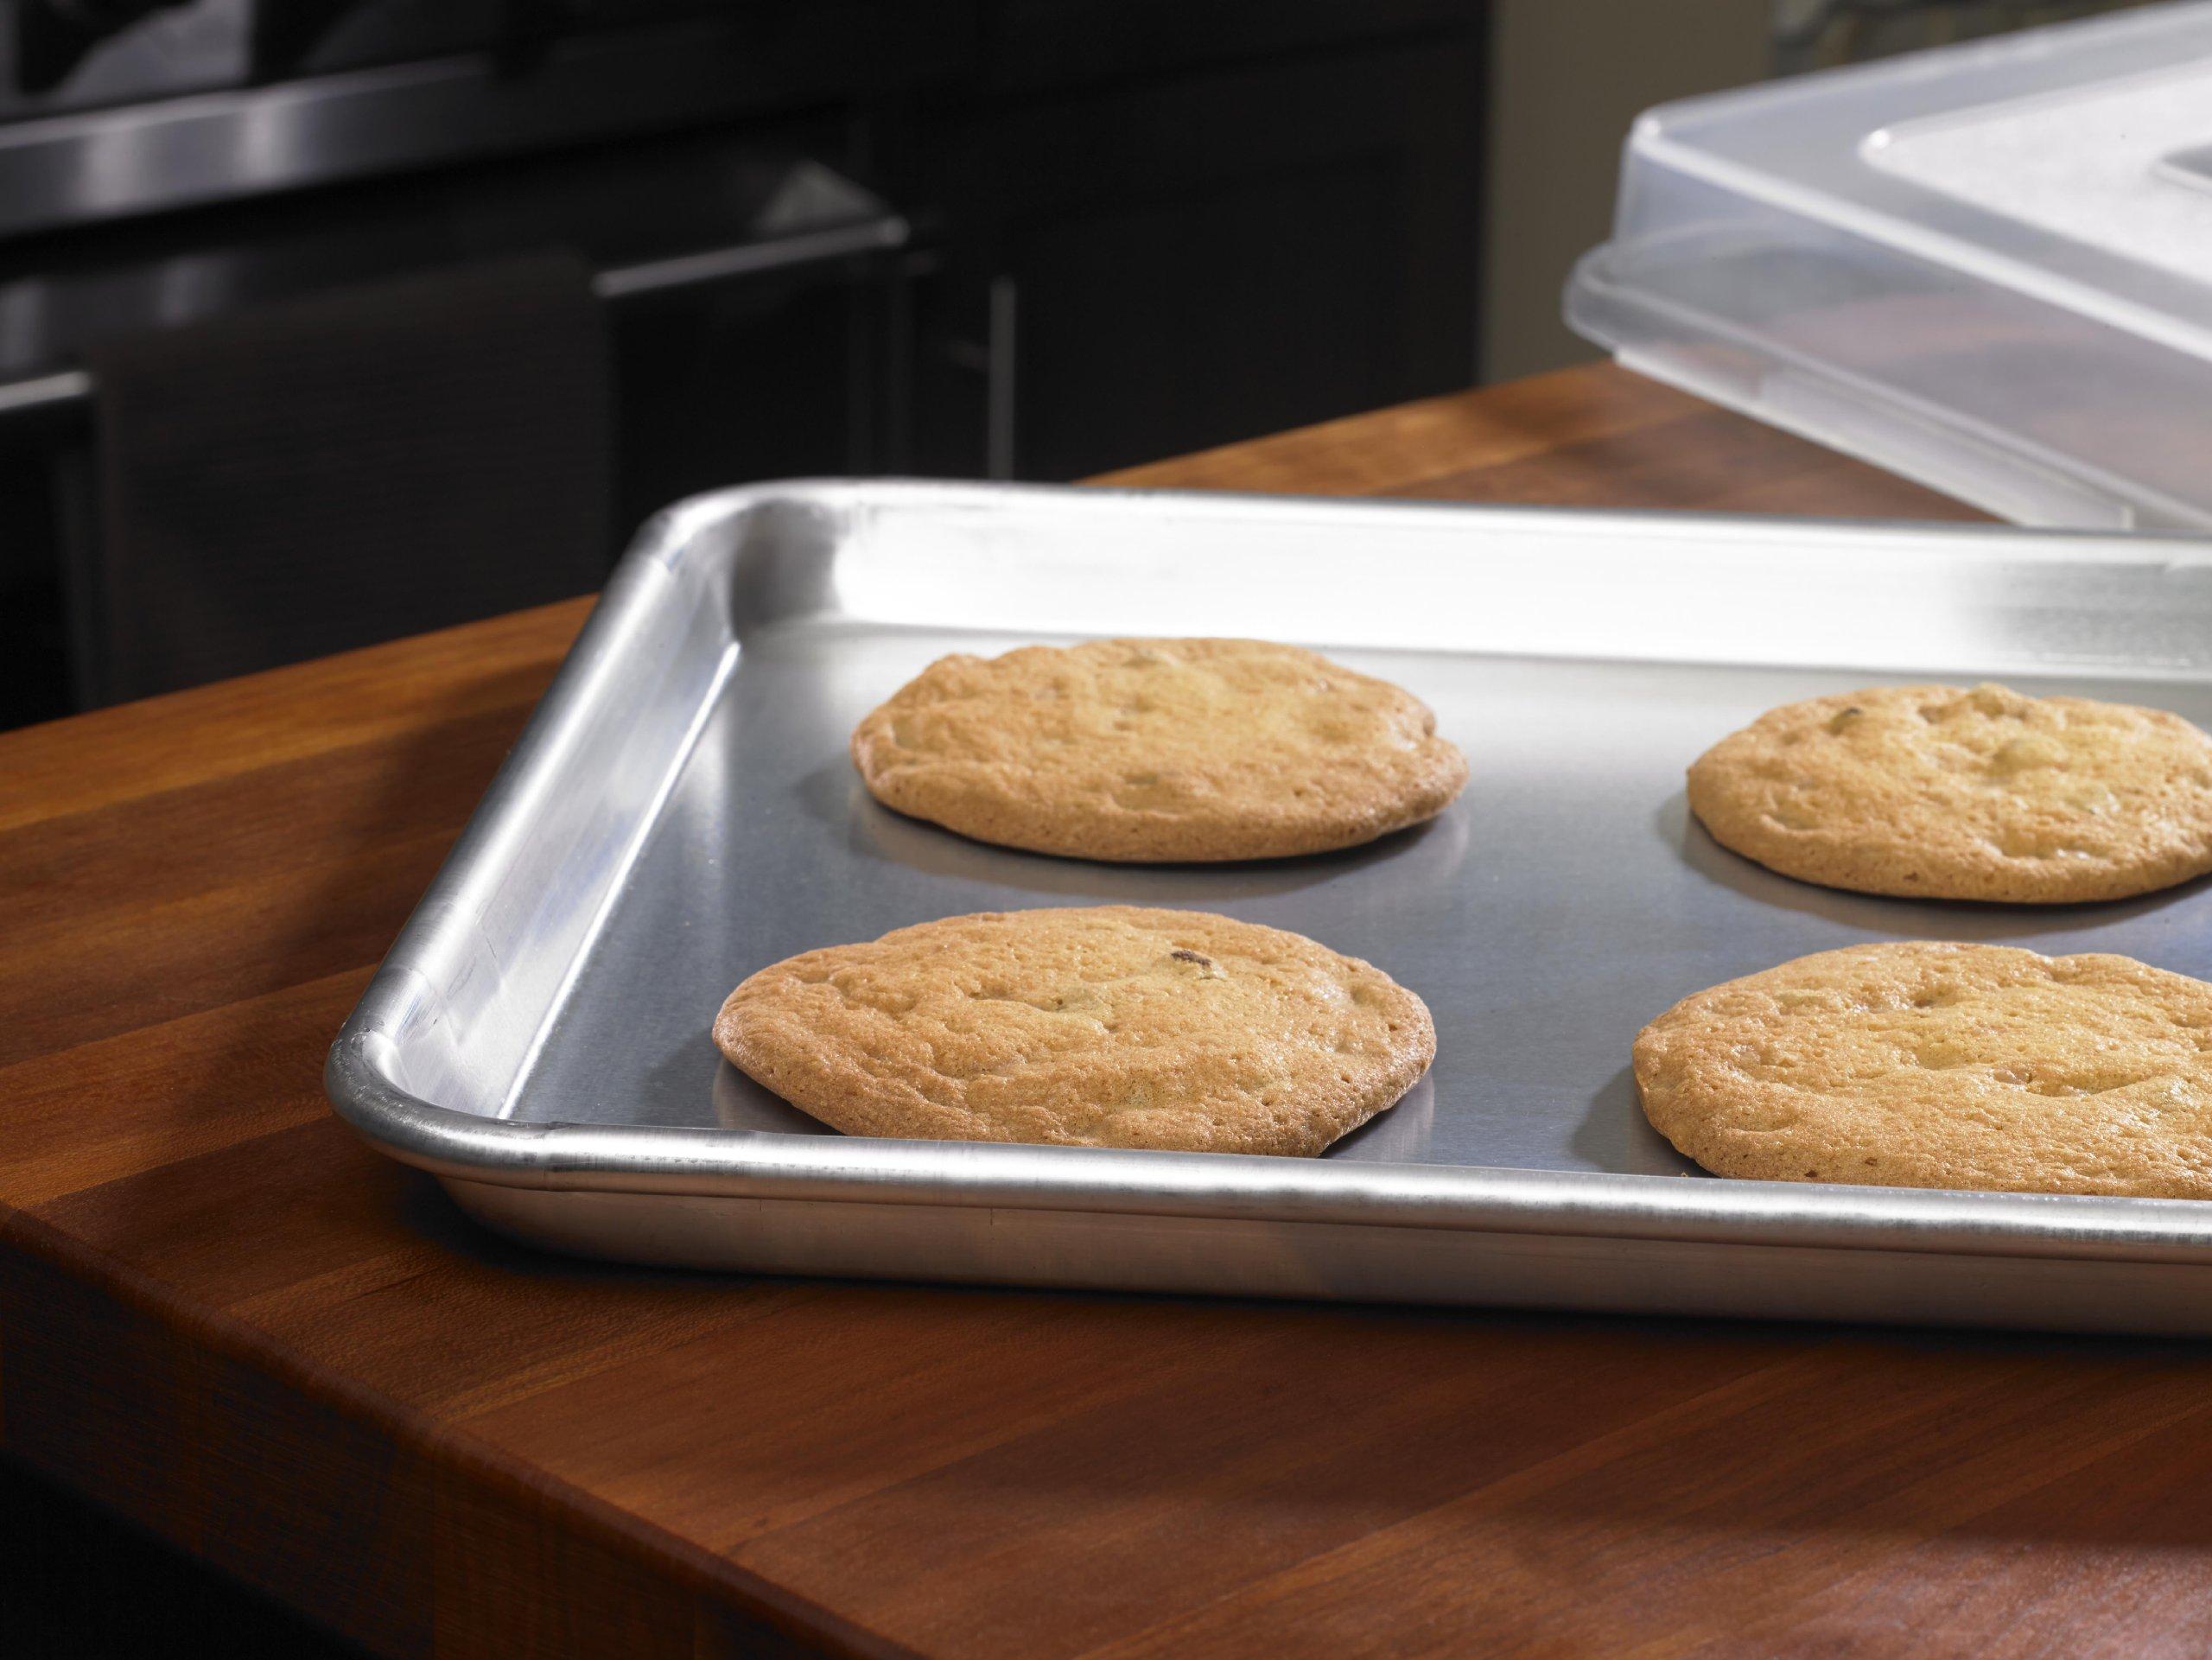 Artisan Professional Classic Aluminum Baking Sheet Pan with Lip, 18 x 13-inch Half Sheet by Artisan